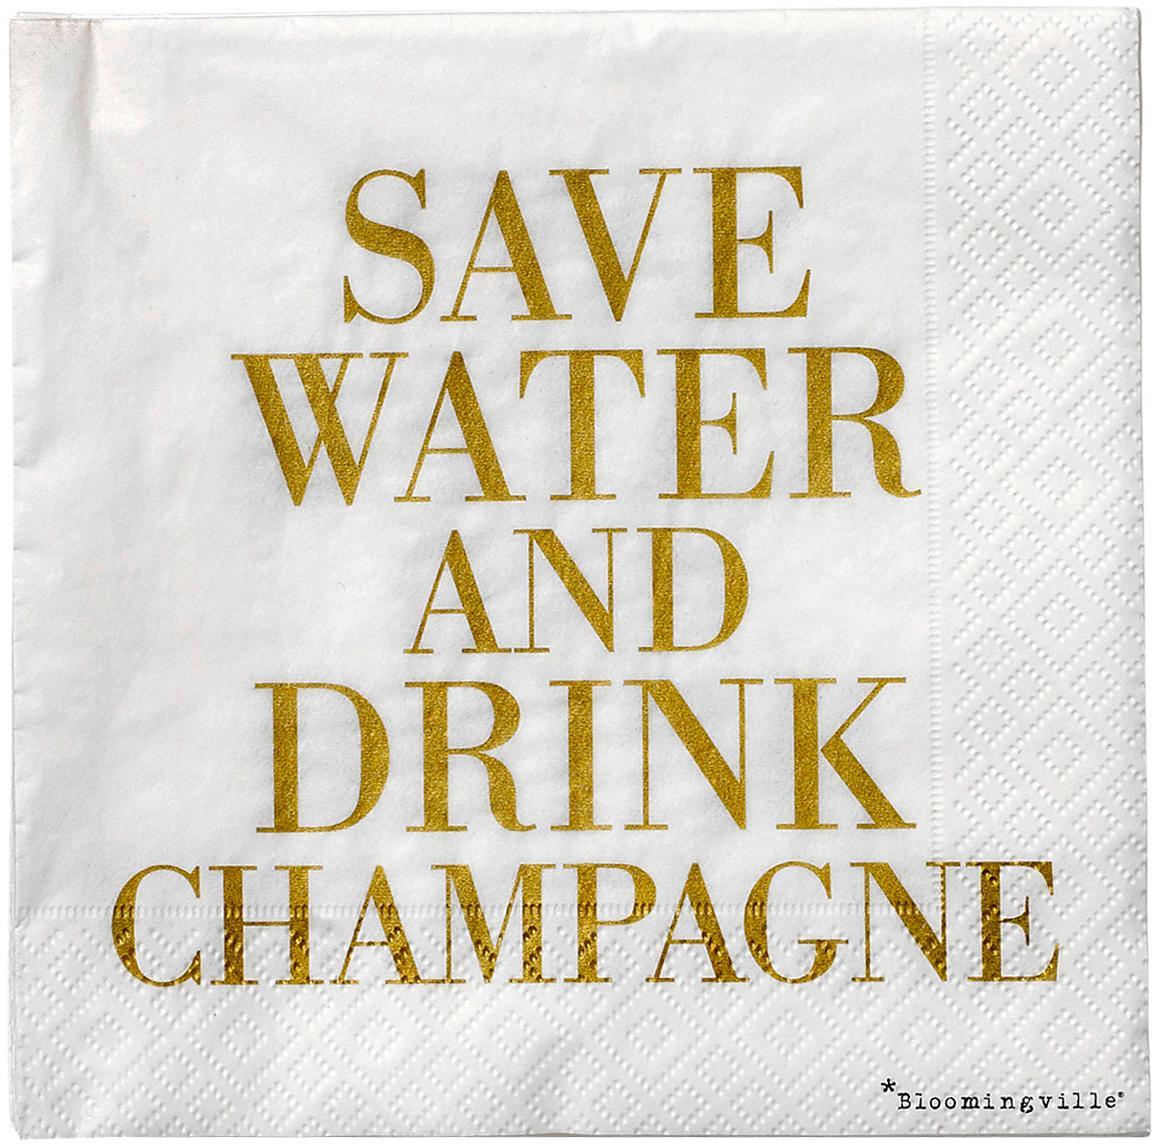 Papier-Servietten Save Water, 20 Stück, Papier, Goldfarben, Weiß, 33 x 33 cm